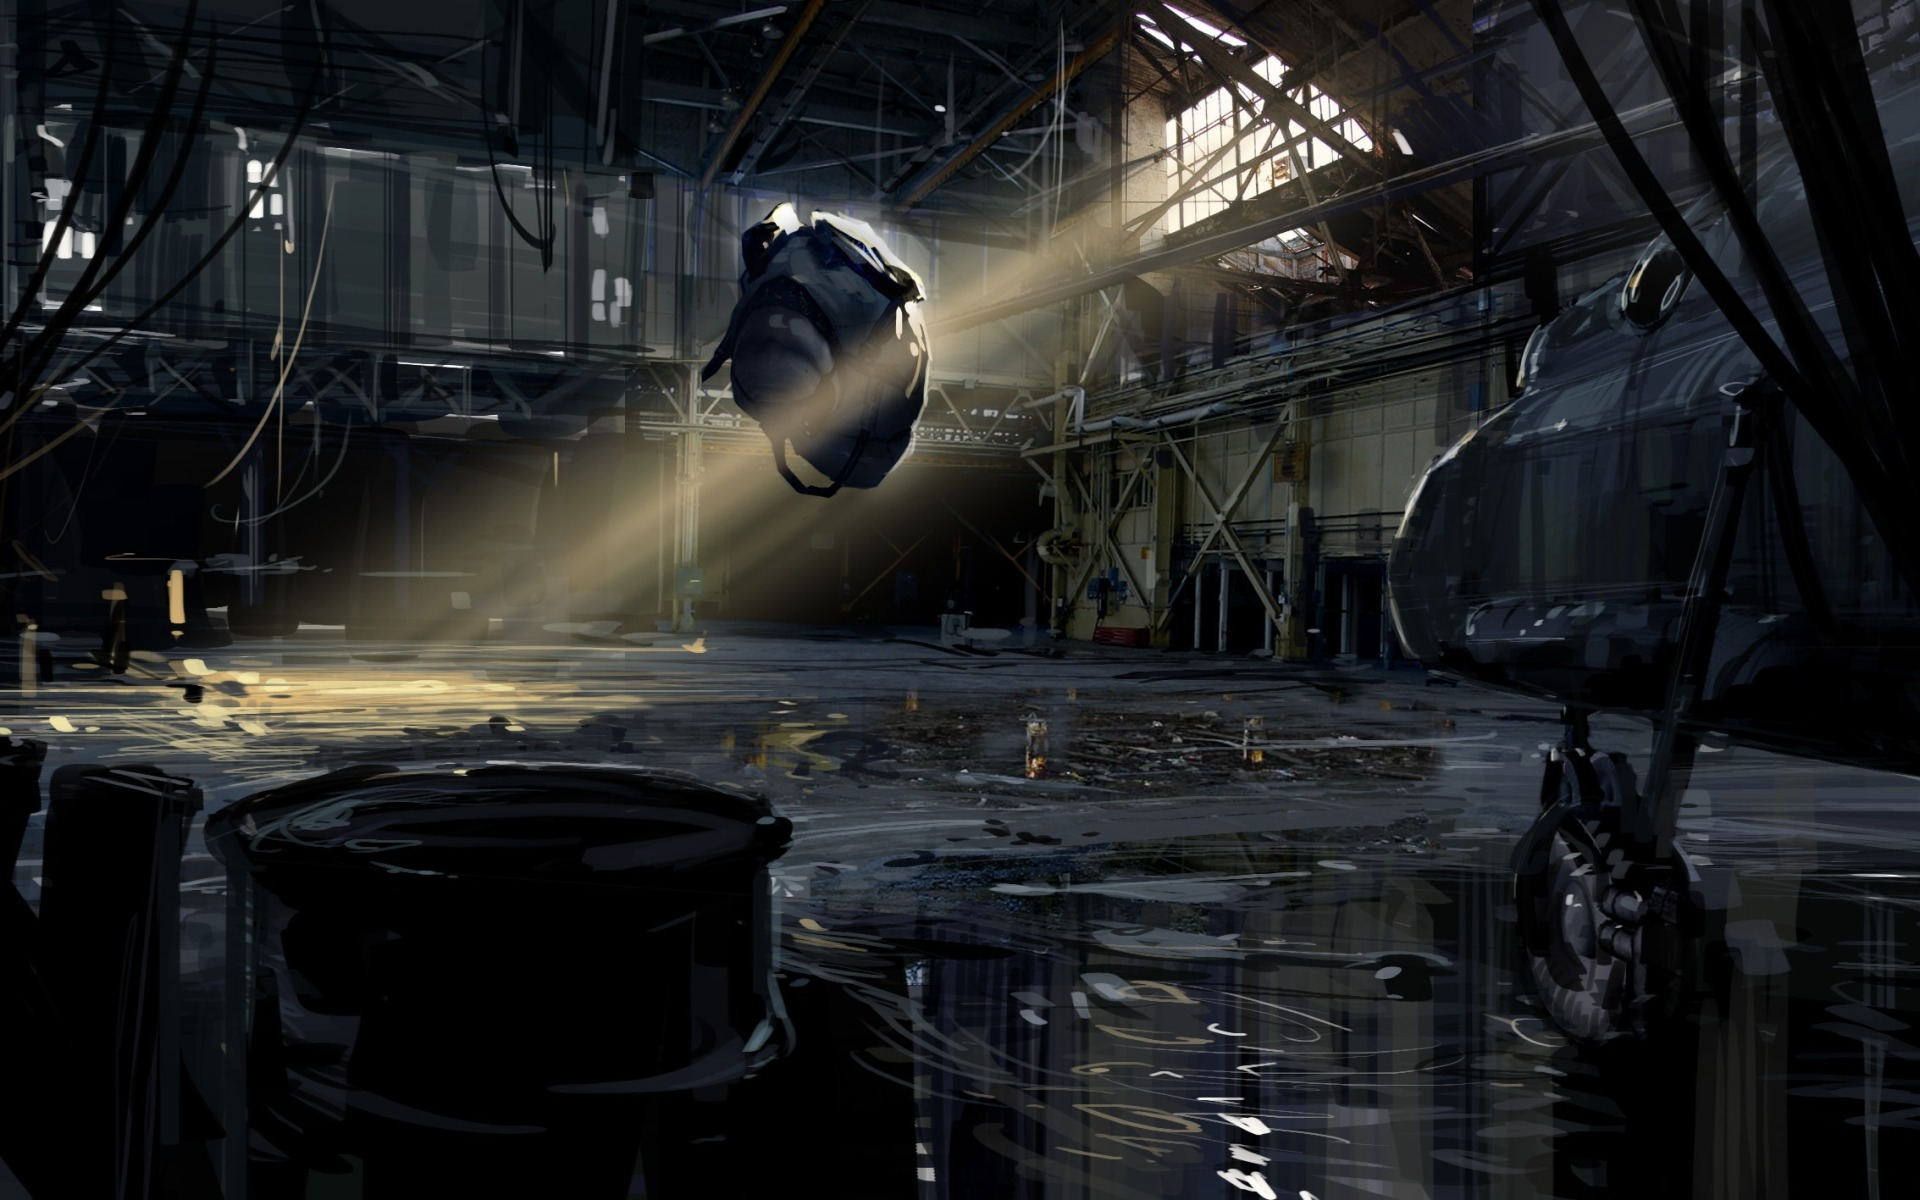 Советник - Half-Life 2 Арт, Персонаж